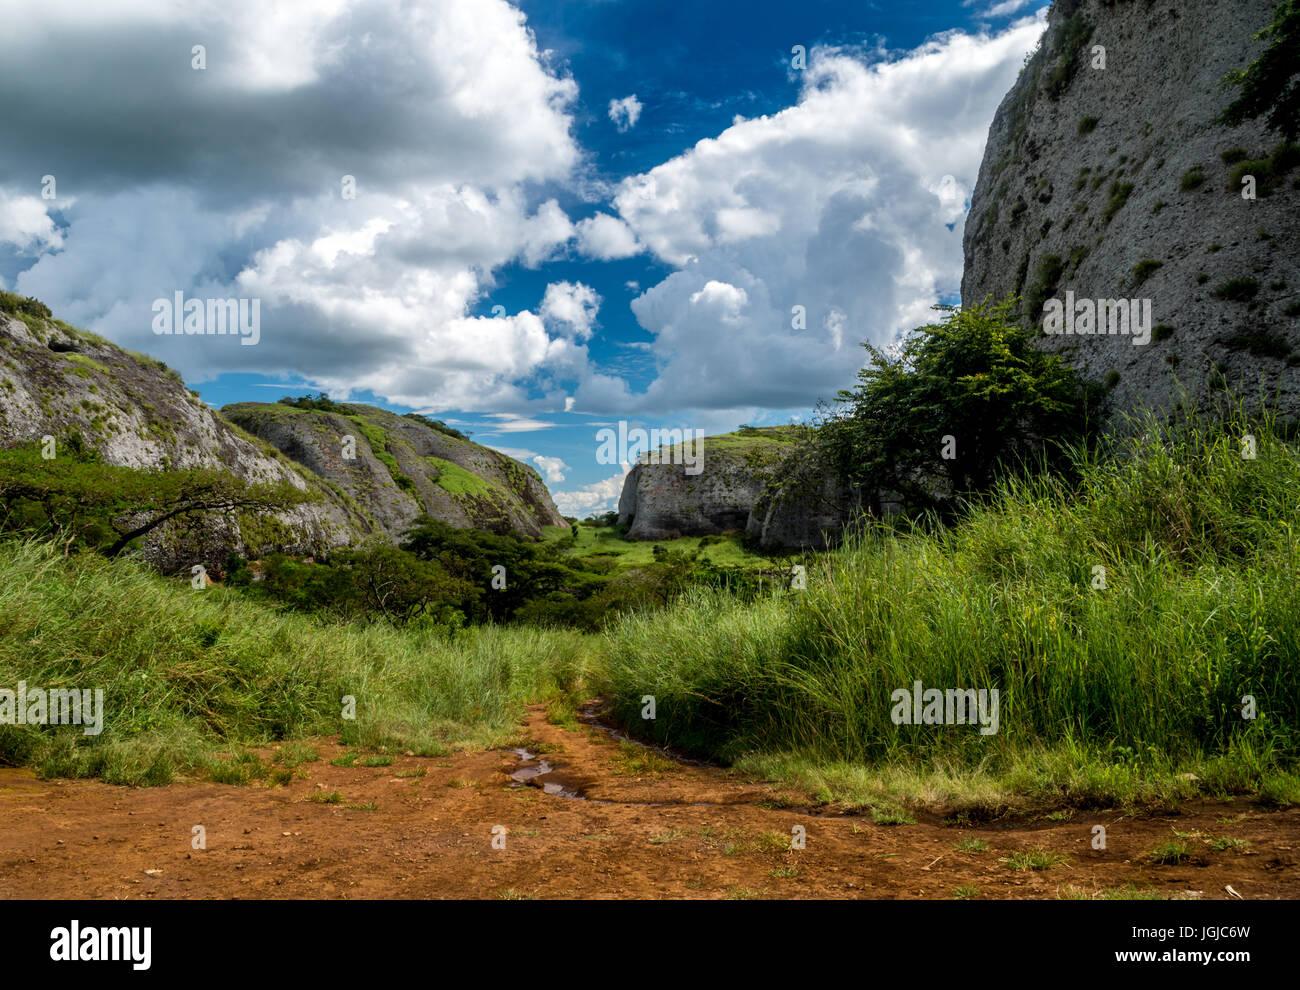 The Black Rocks of Pungo Andongo, Angola Stock Photo